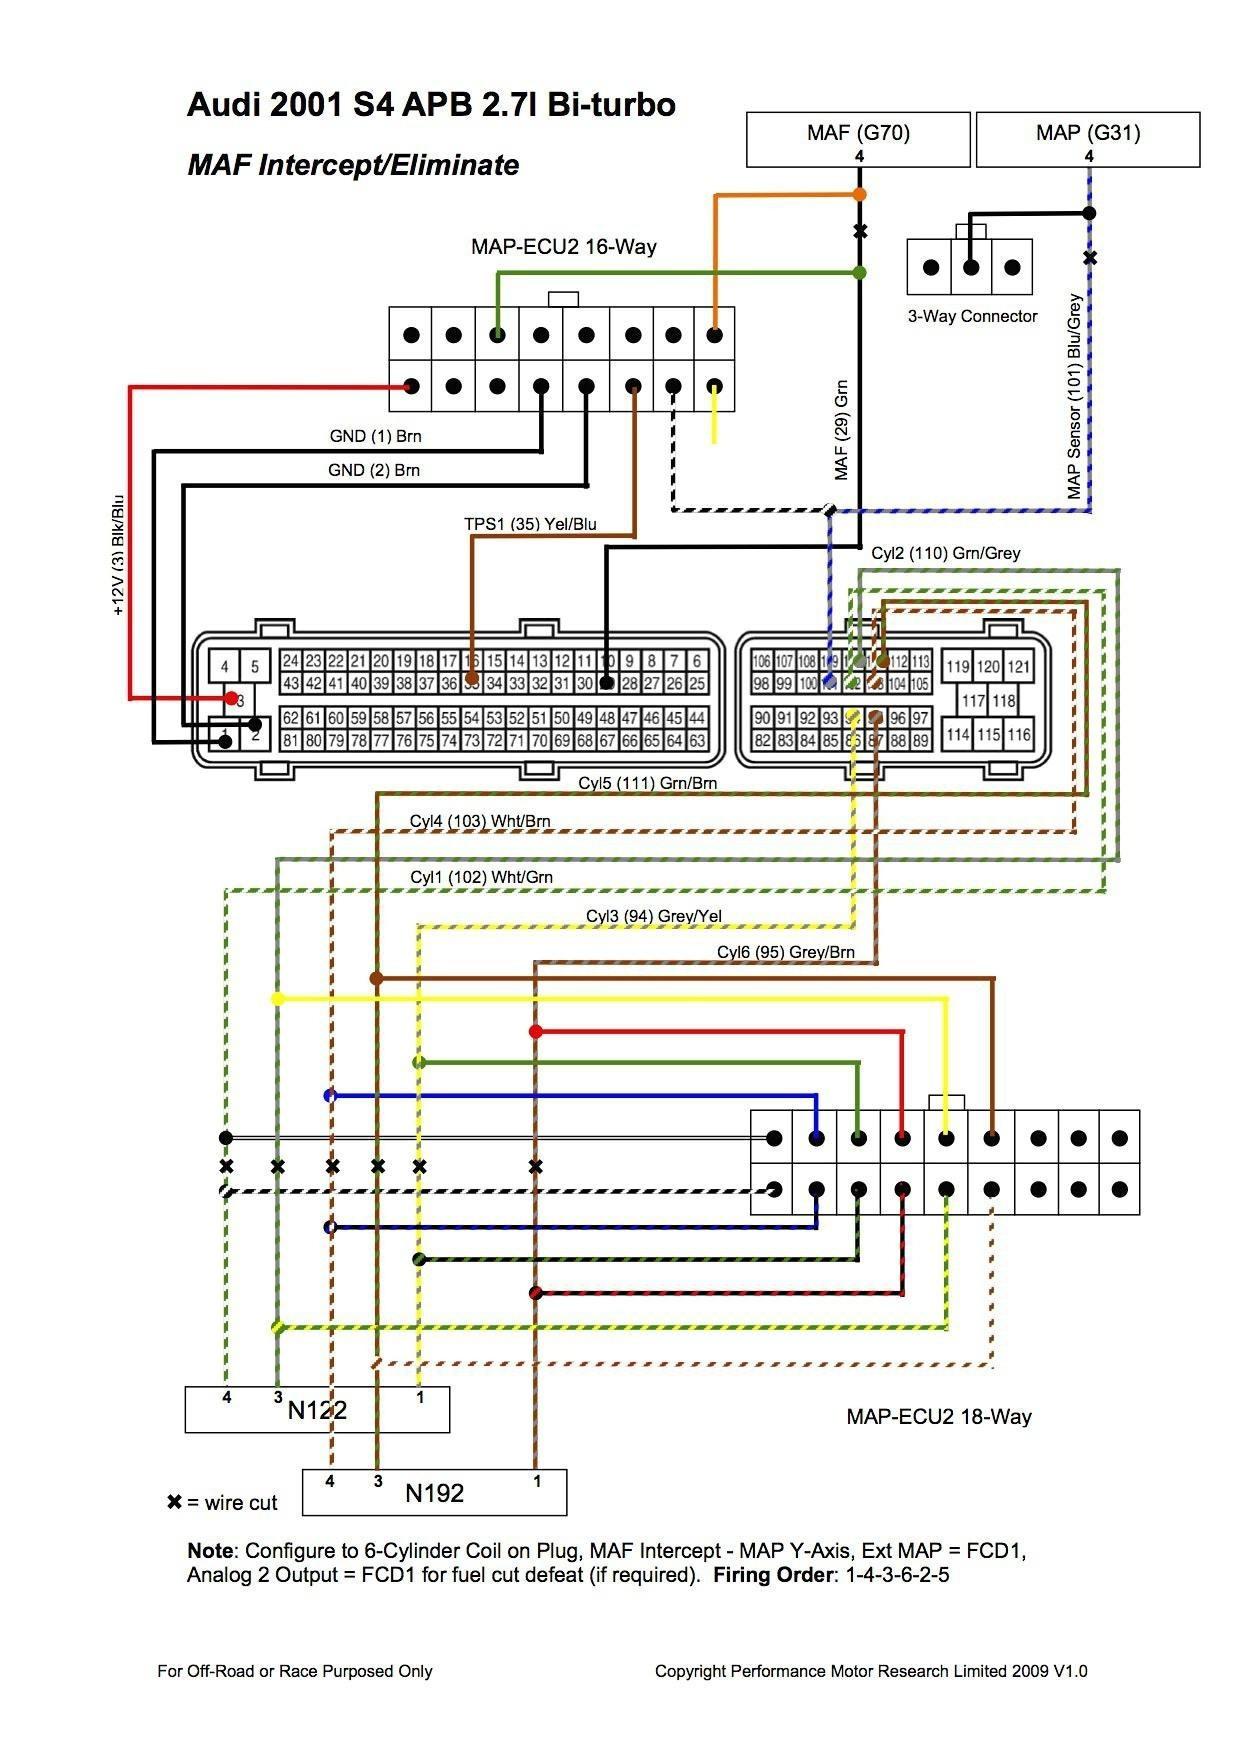 1996 Dodge Ram Trailer Wiring Diagram